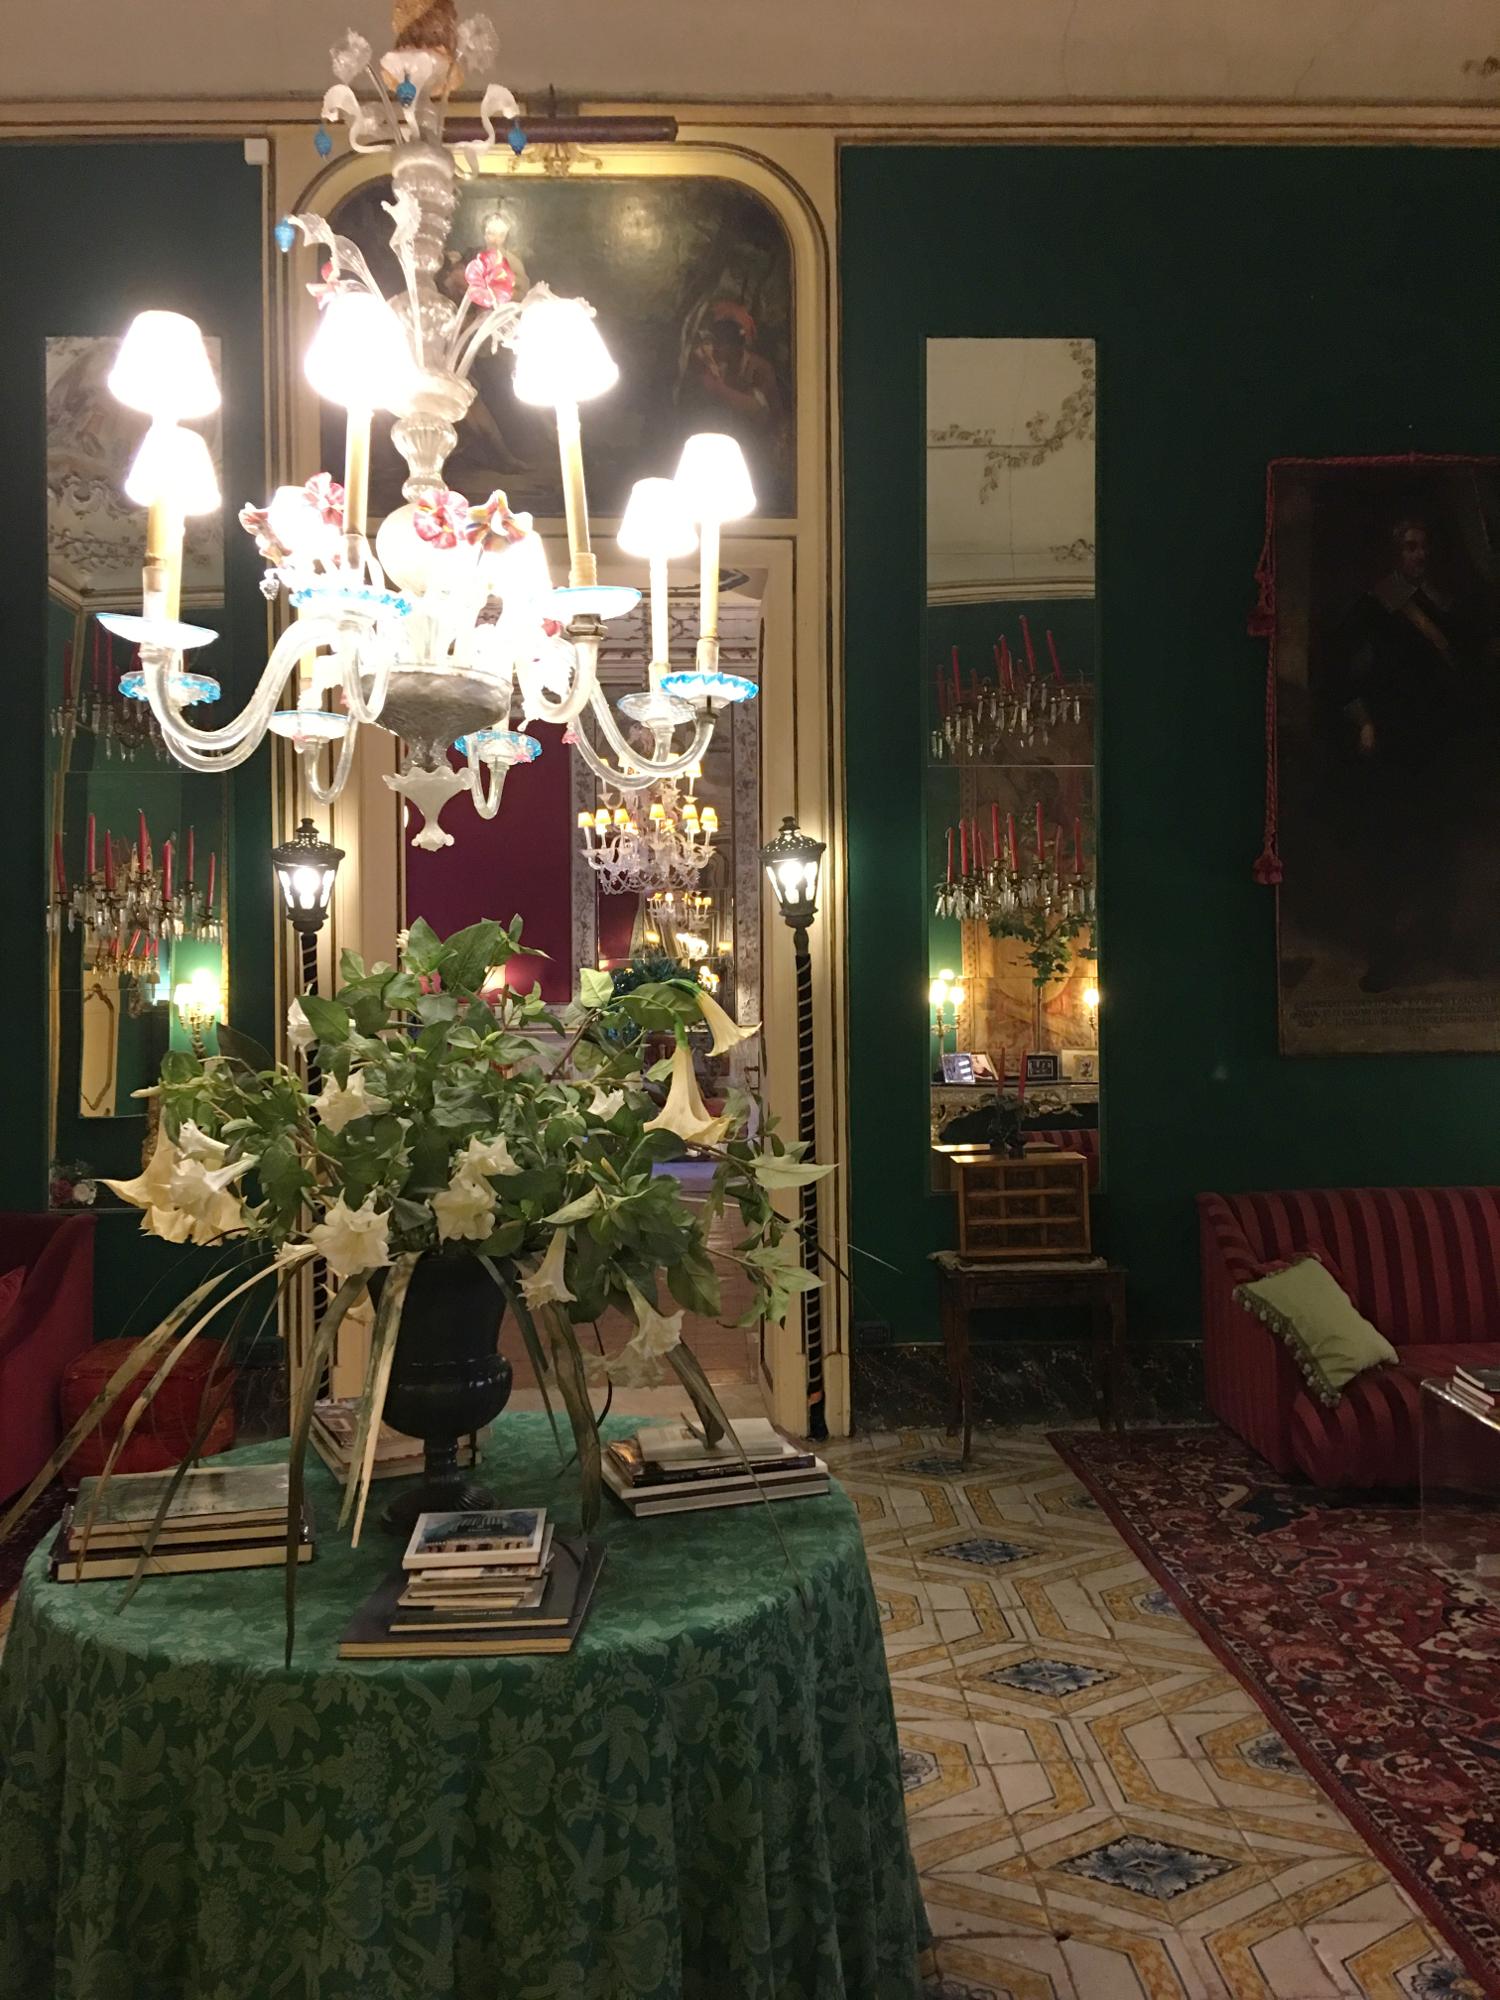 rocaille-blog-palermo-palazzo-ajutamicristo-3